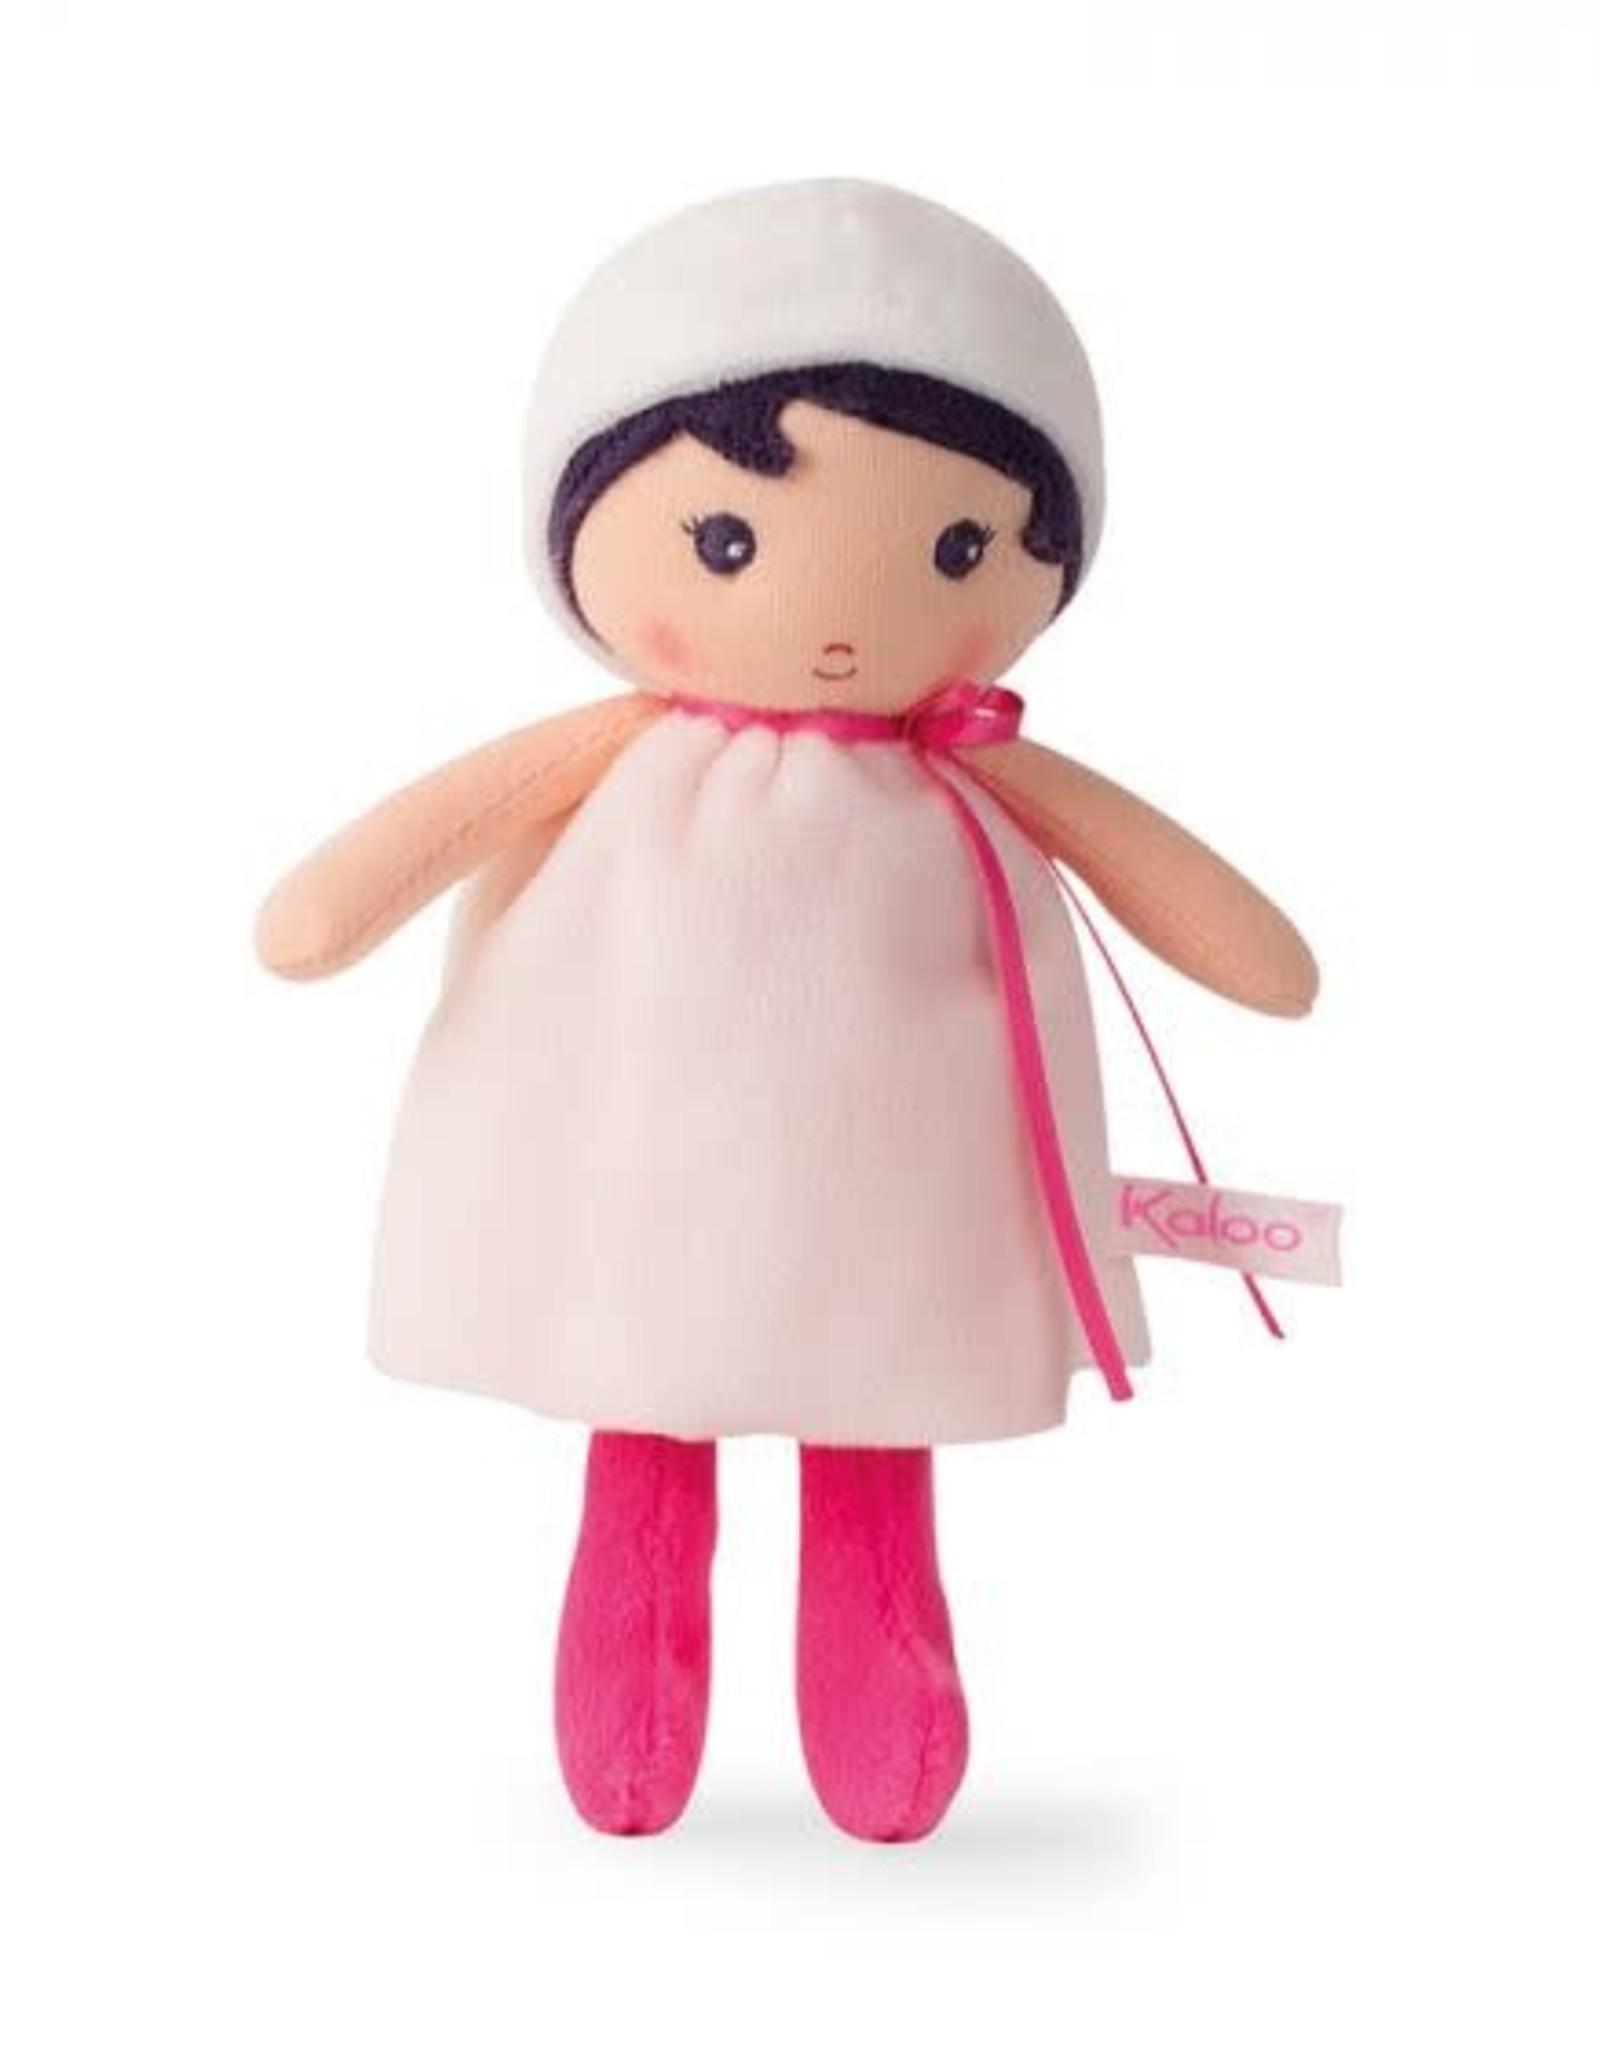 Kaloo Kaloo Perle K Doll - Small